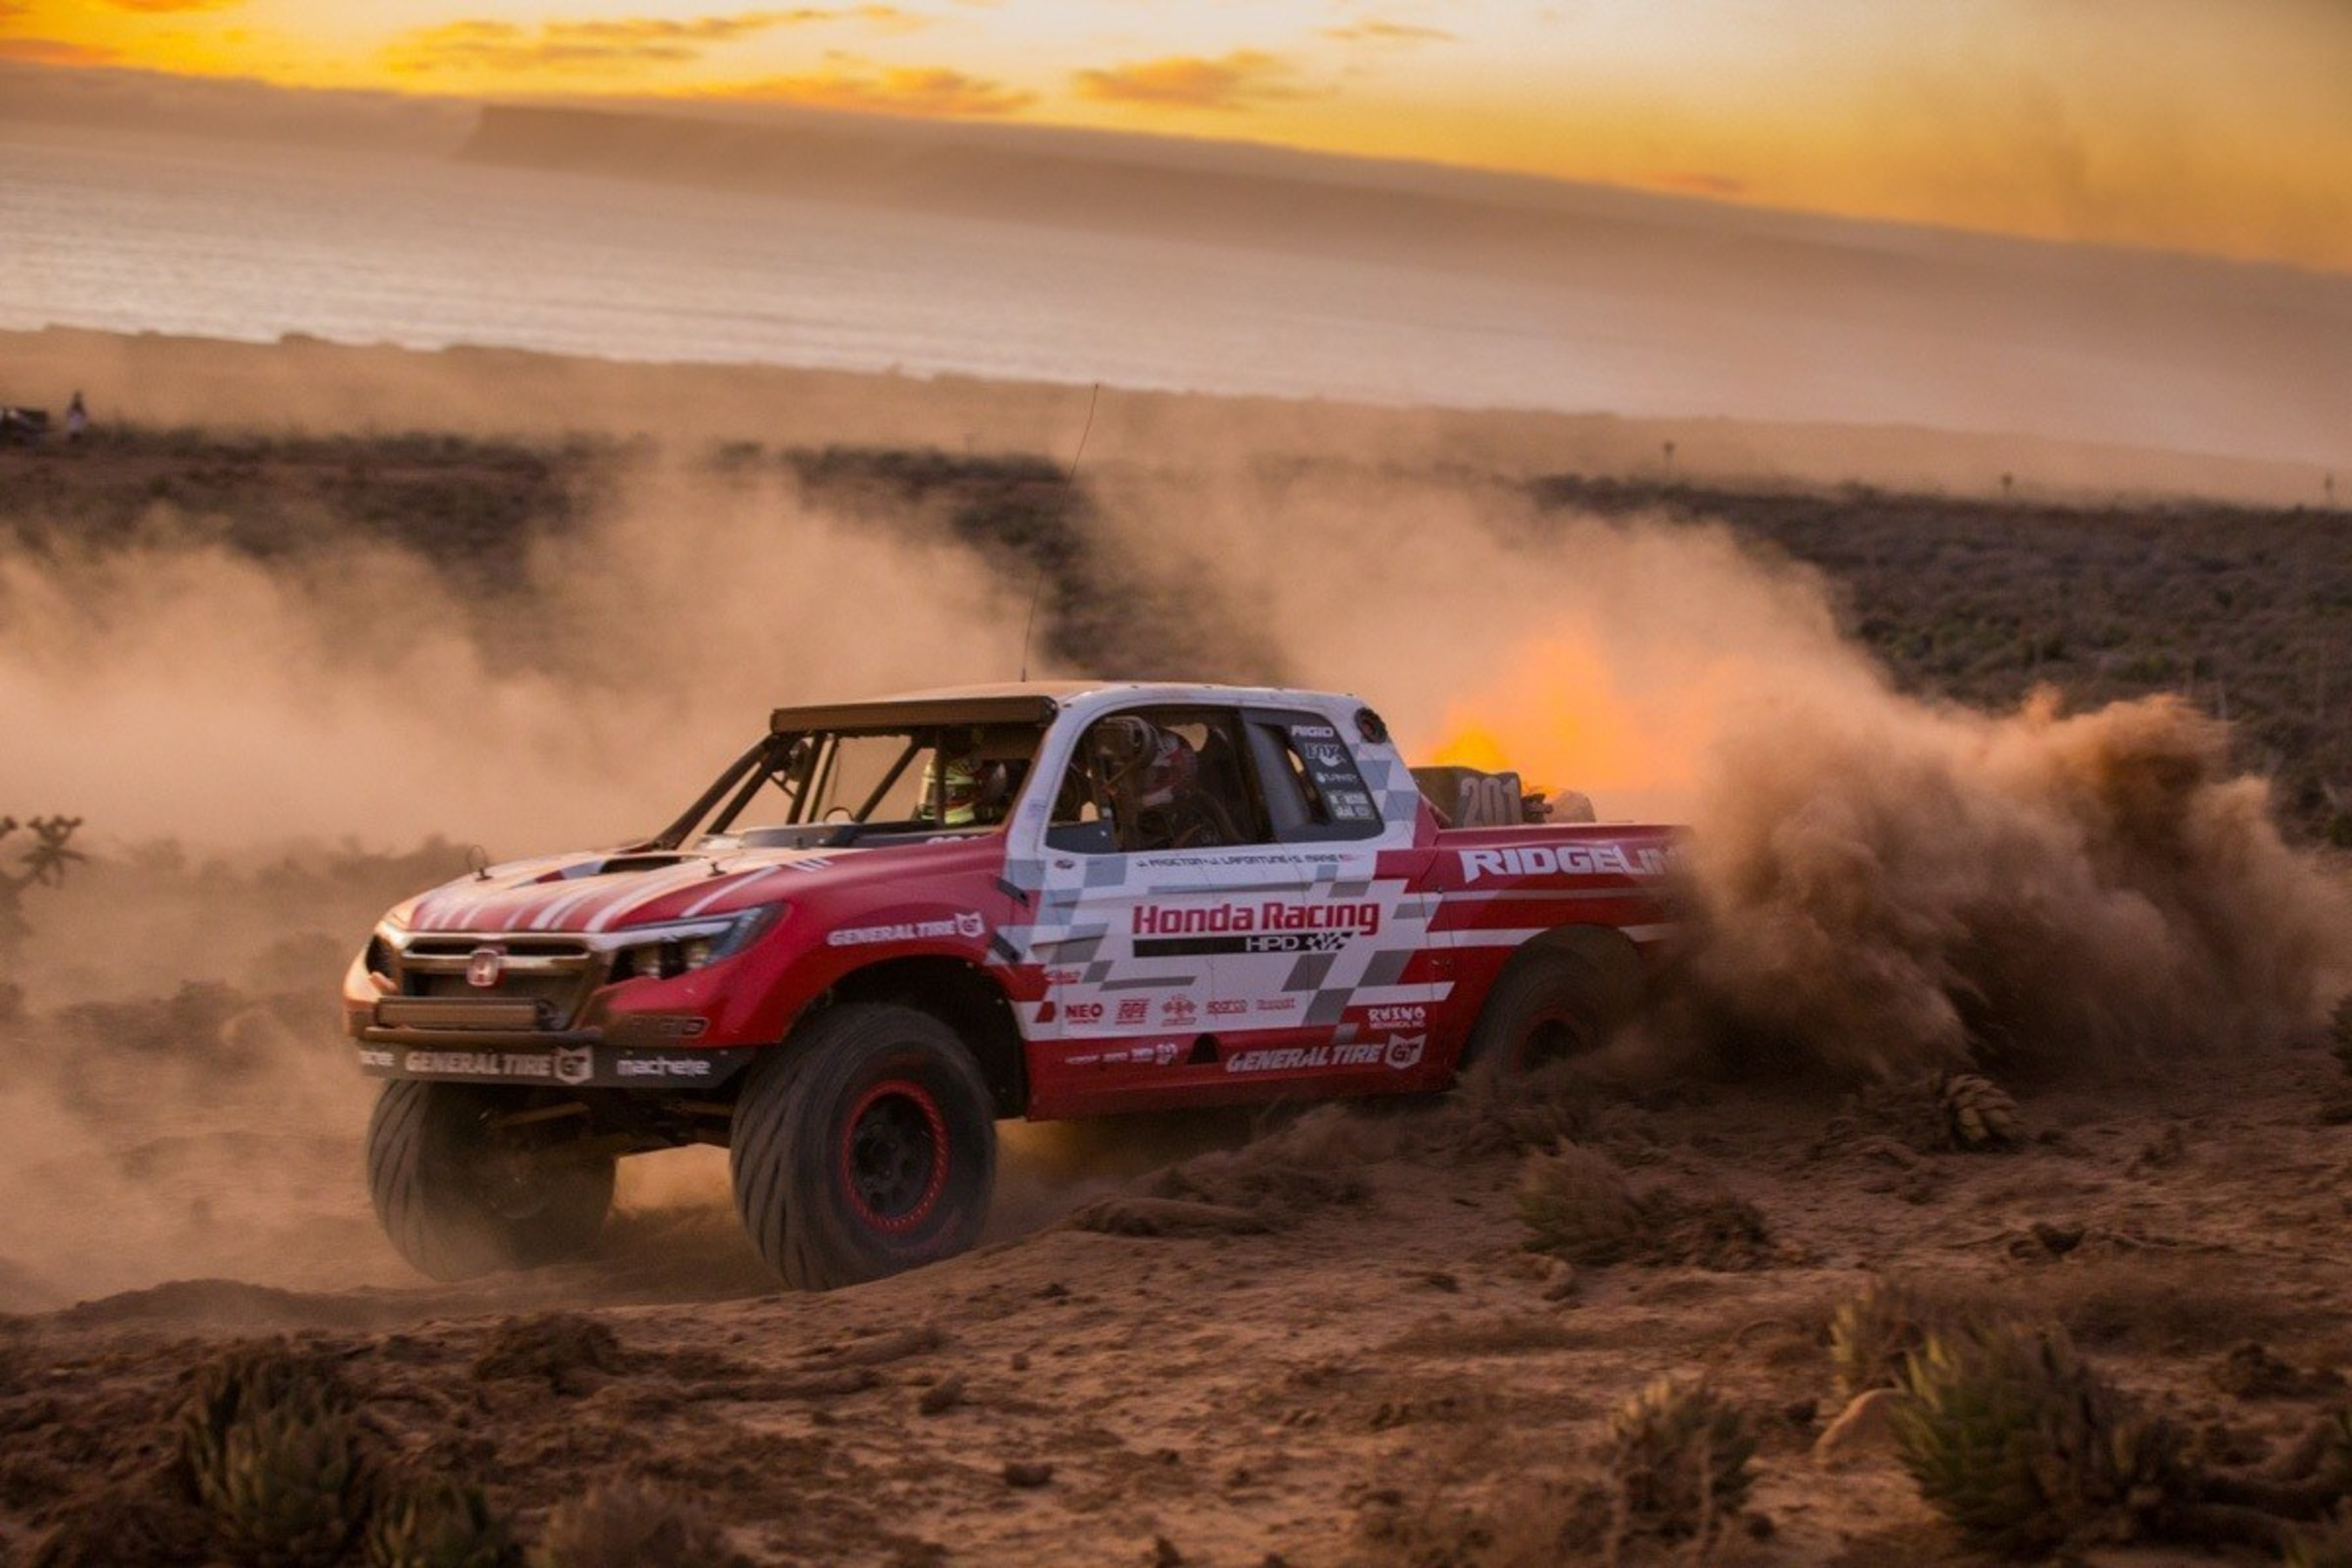 The new Honda Ridgeline Baja Race Truck won the Class 2 Unlimited category in this weekend's SCORE Baja 1000